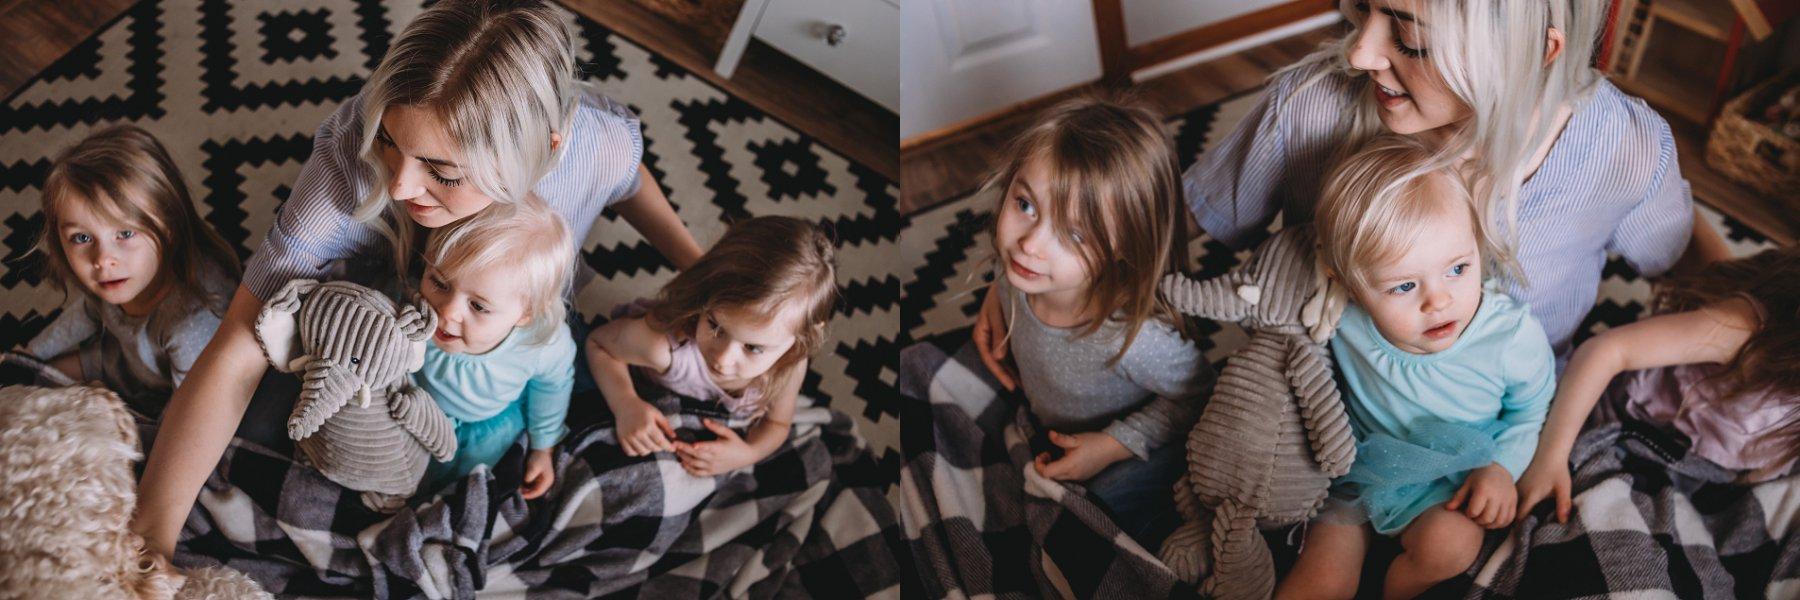 Documentary Lifestyle Motherhood Photography in Kansas City by Merry Ohler | Family Photographer Kansas City 16